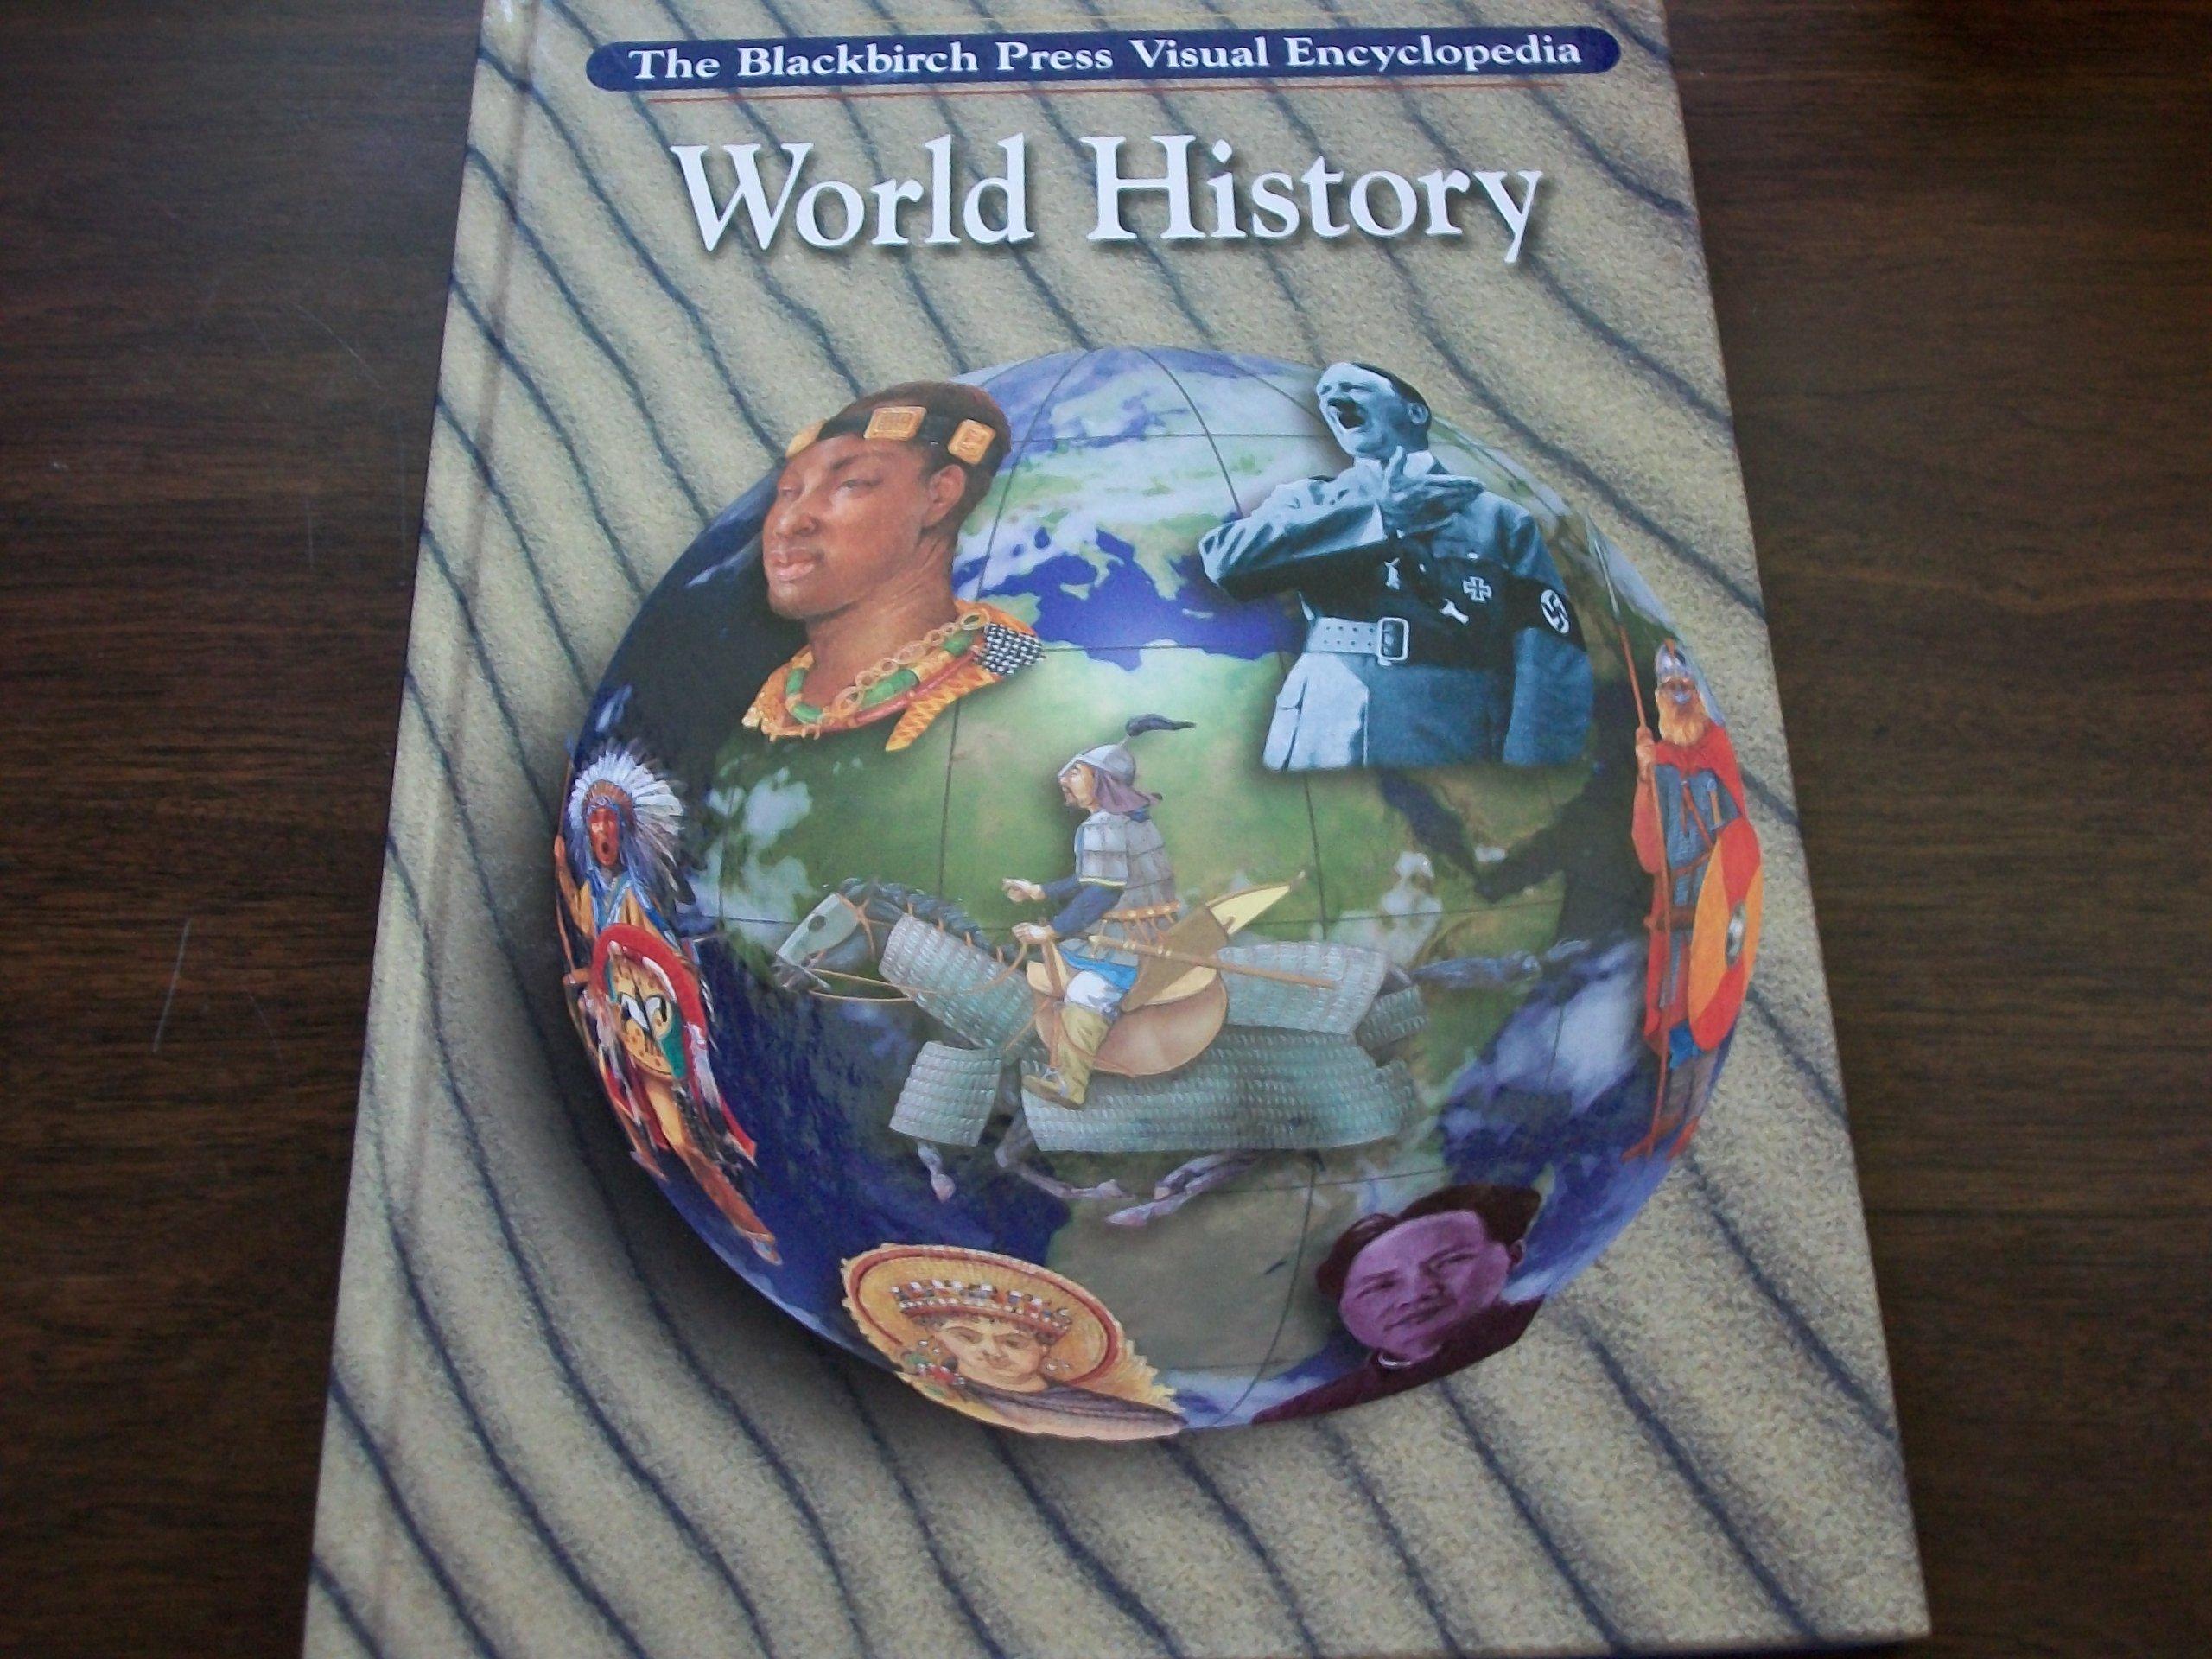 Blackbirch Visual Encyclopedias - World History pdf